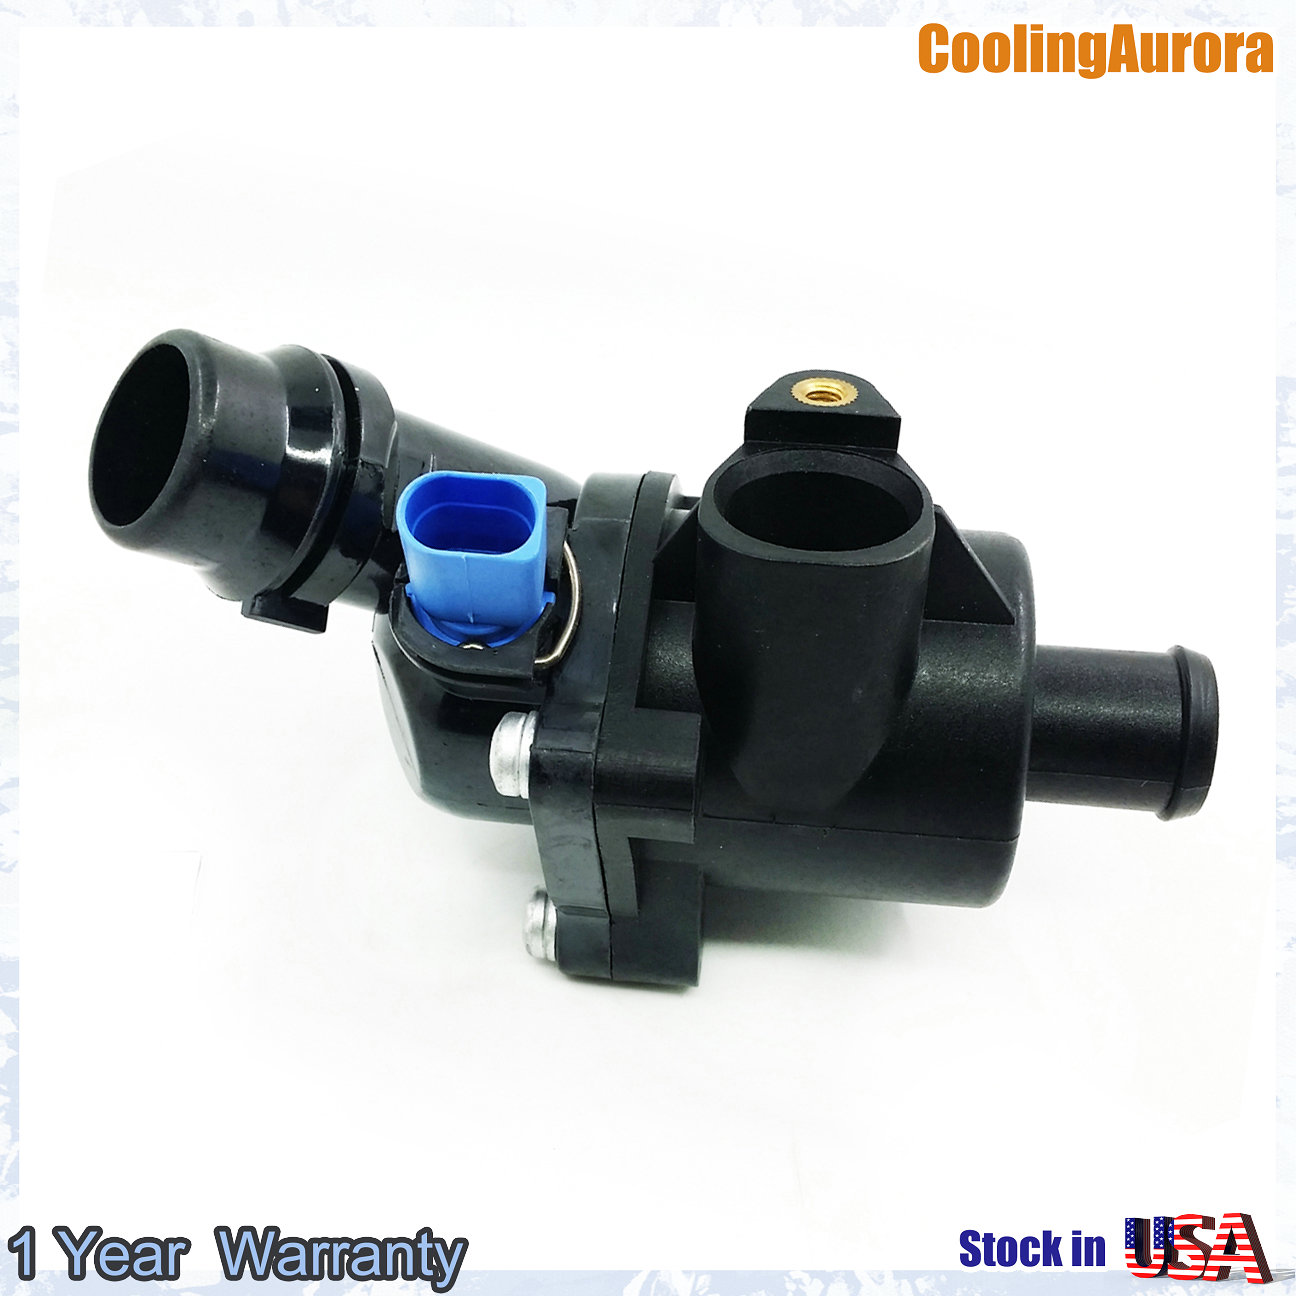 Engine Coolant Thermostat Kit 06B121111K for VW Passat for Audi B6 1.8T